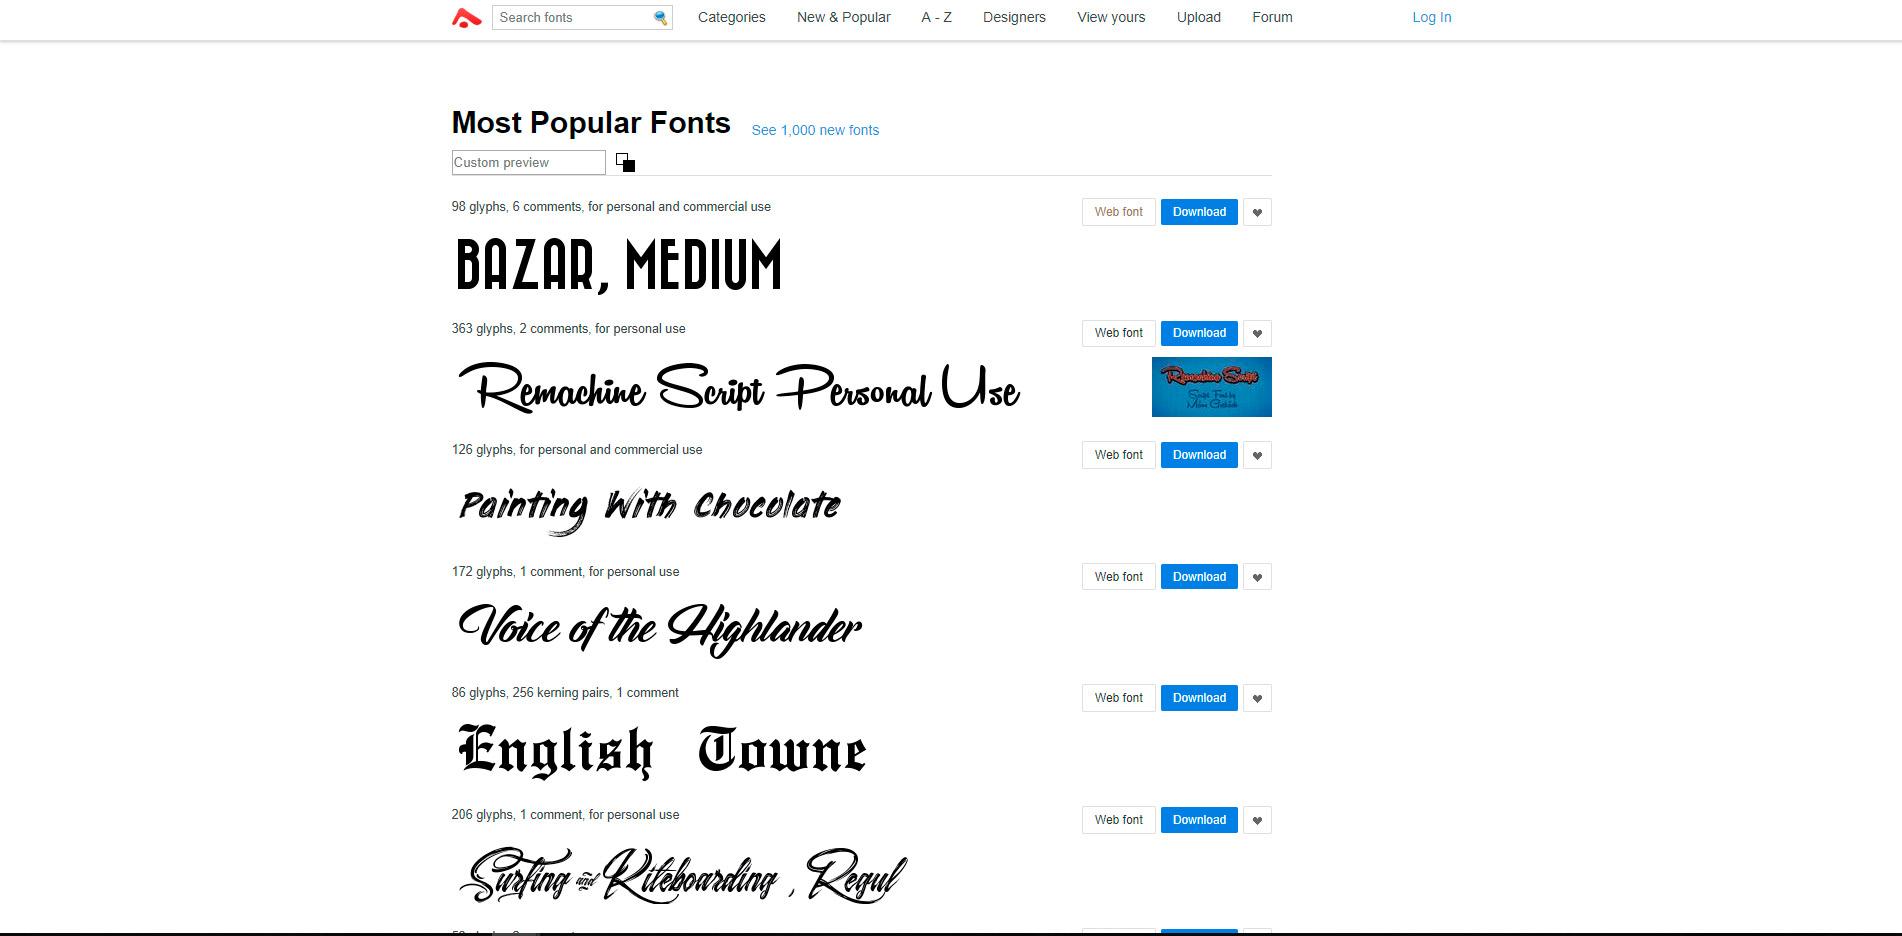 017_mejores_sitios_descarga_gratis_tipografia_fuentes_fonts__abstractfonts